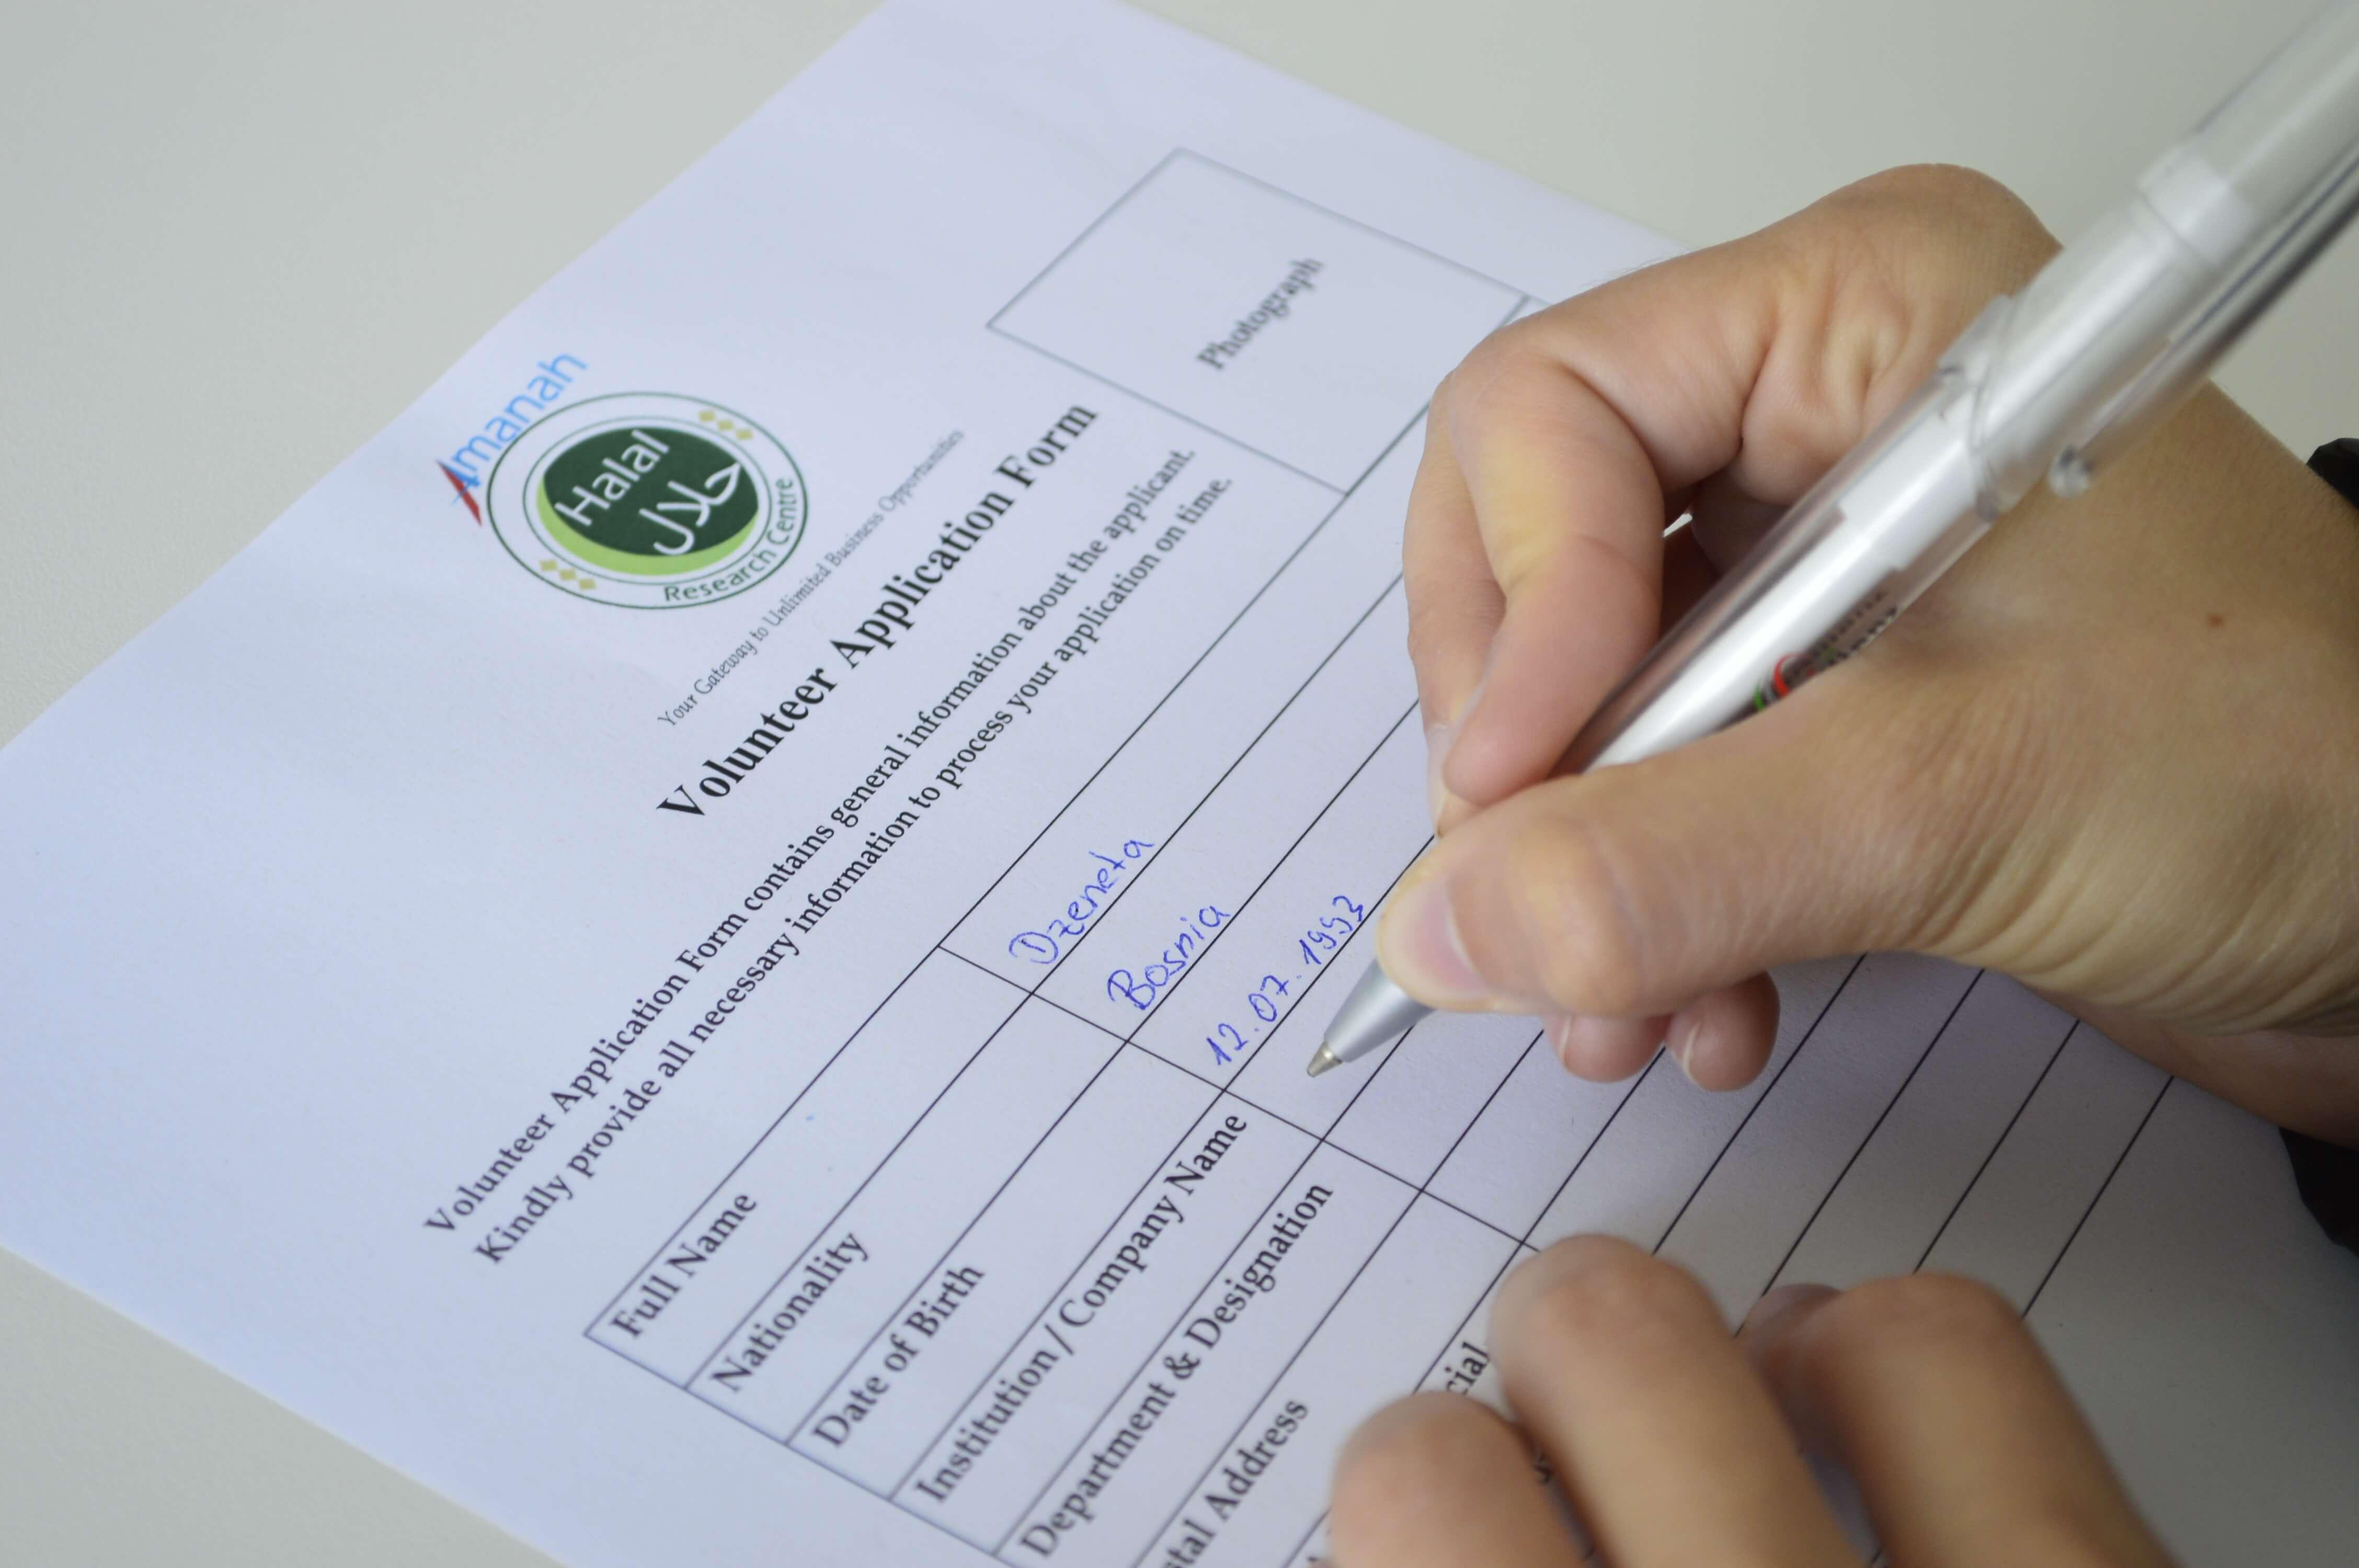 Volunteering Amanah Halal Research Centre